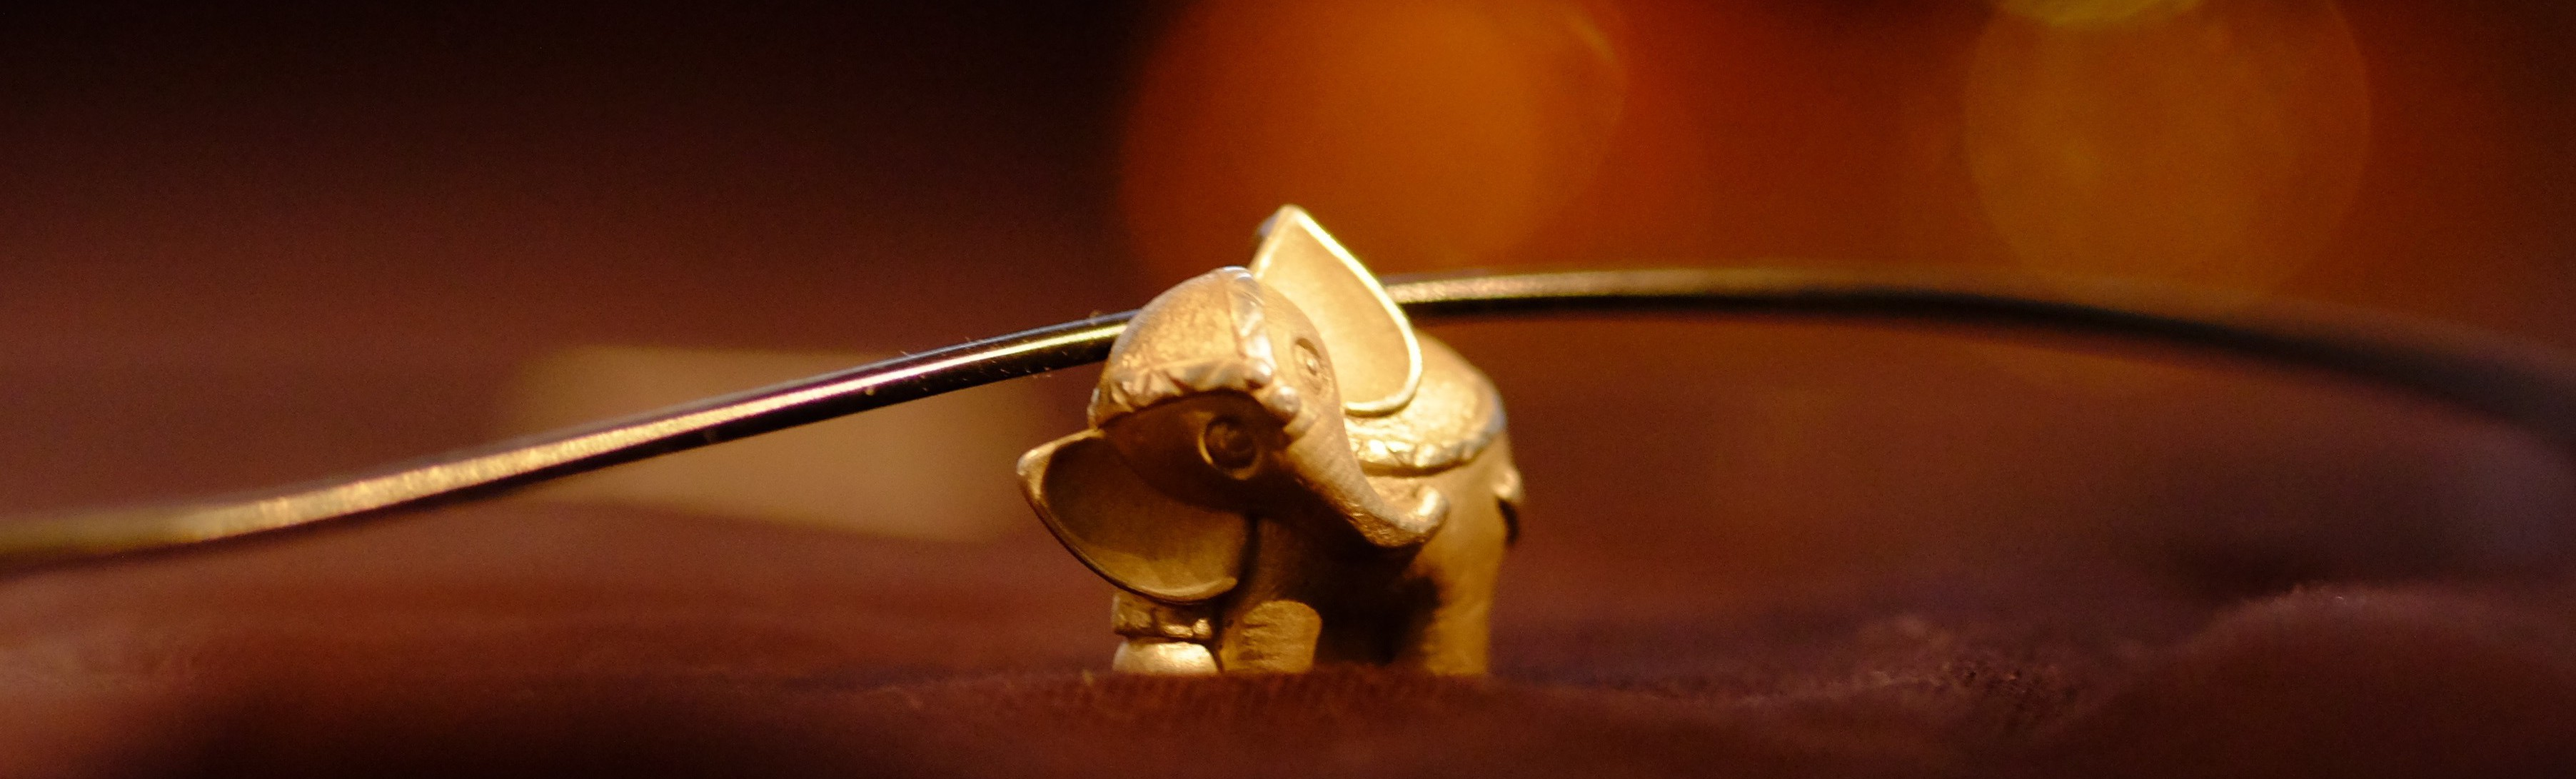 gennari-schmuck-elefanticum-004